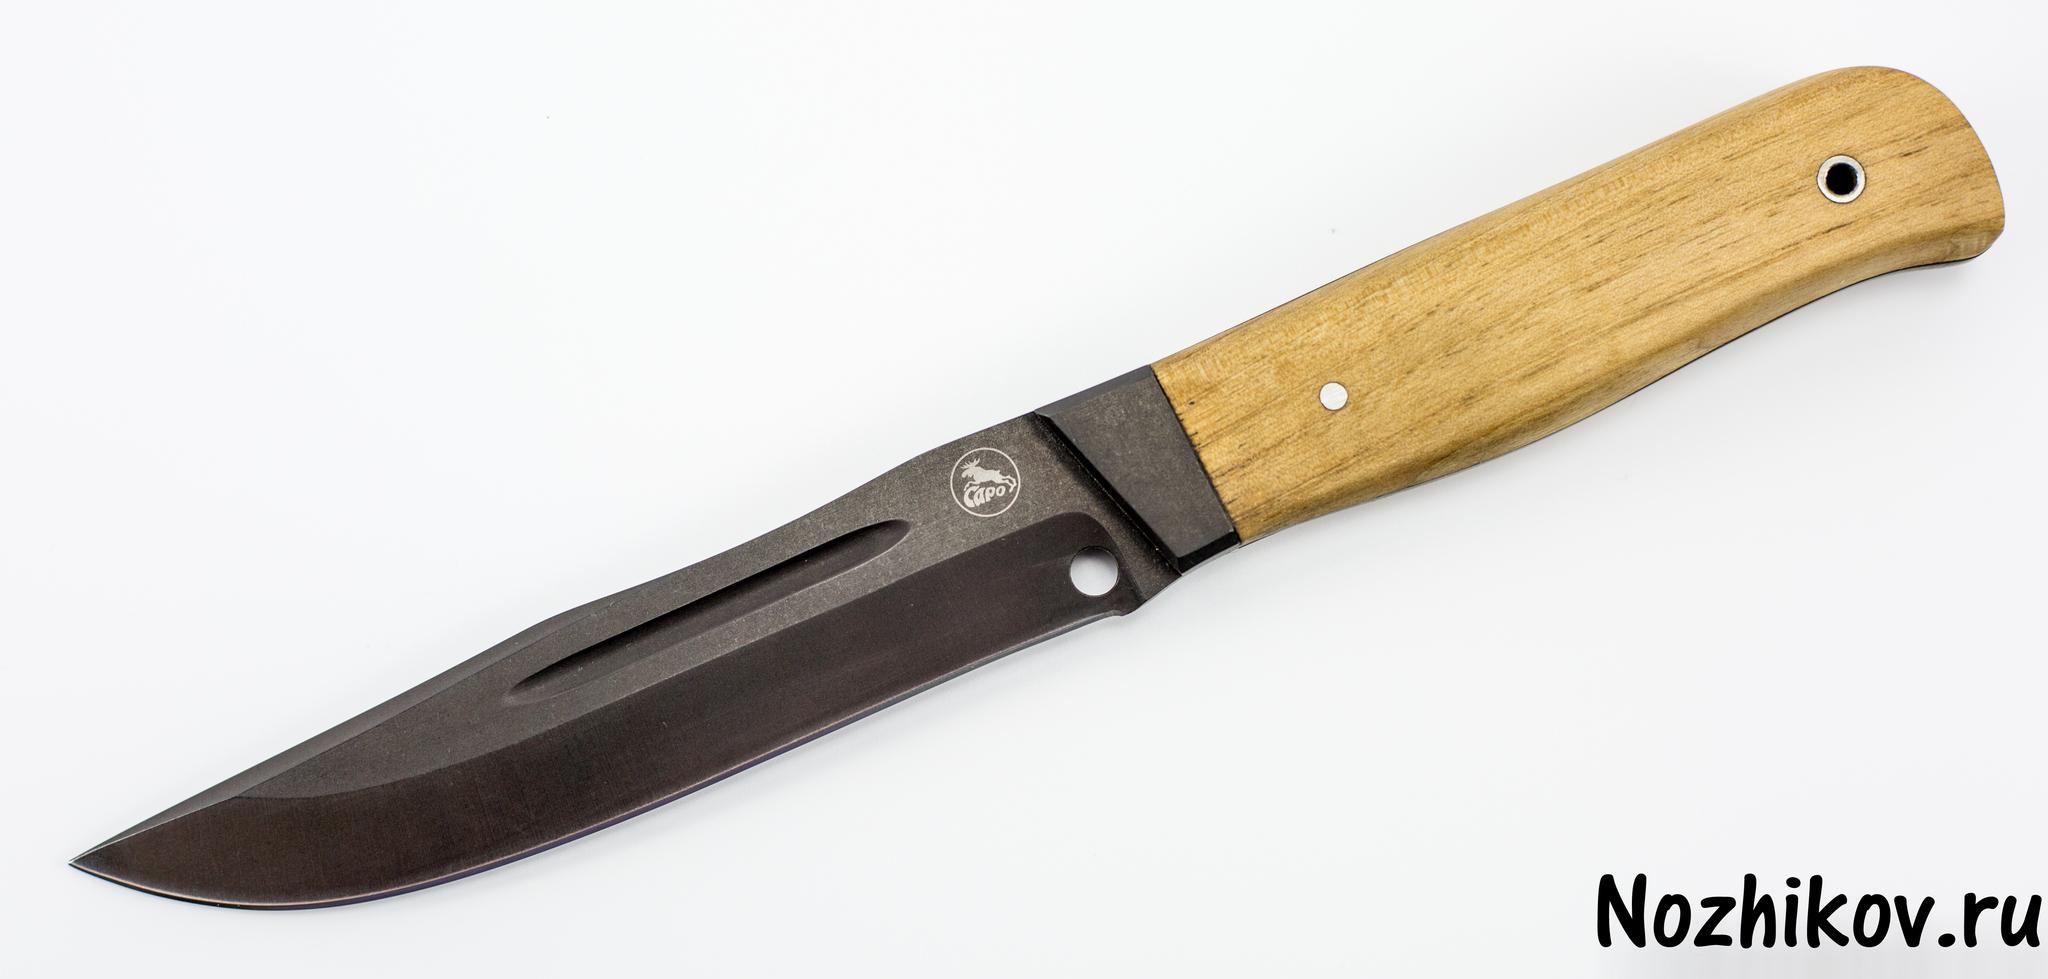 Нож Каюр, 65ГНожи Ворсма<br>Сталь 65ГРукоять ОрехОбщая длина, мм 250Длина клинка, мм 135Длина рукояти, мм 115Толщина обуха, мм 4,5Ширина клинка, мм 25Толщина рукояти, мм 21,5Чехол Кордура<br>